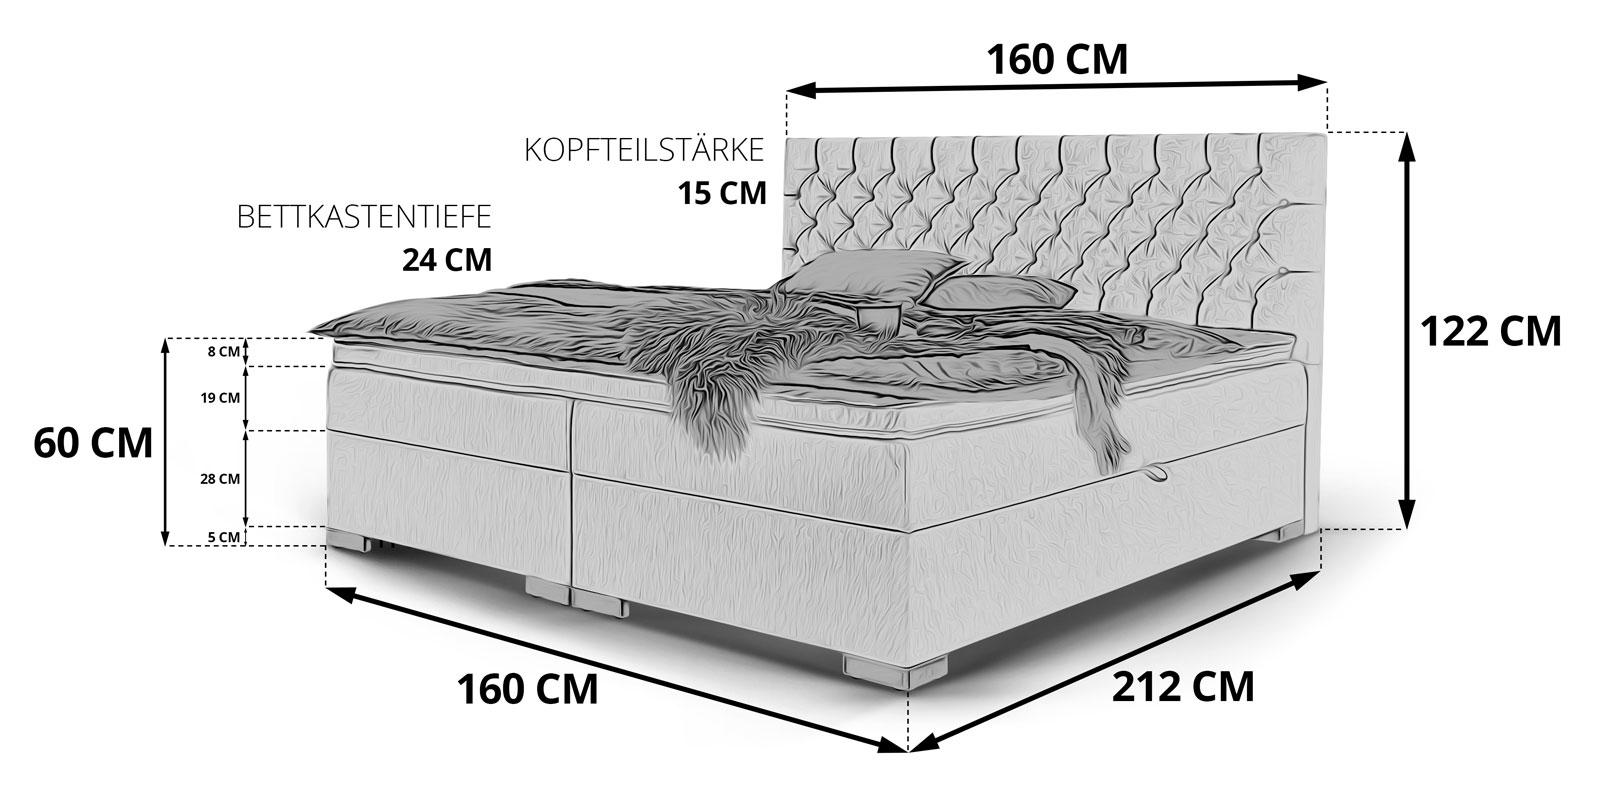 Boxspringbett Mit Bettkasten Stauraum Bett London Skizze 160x200